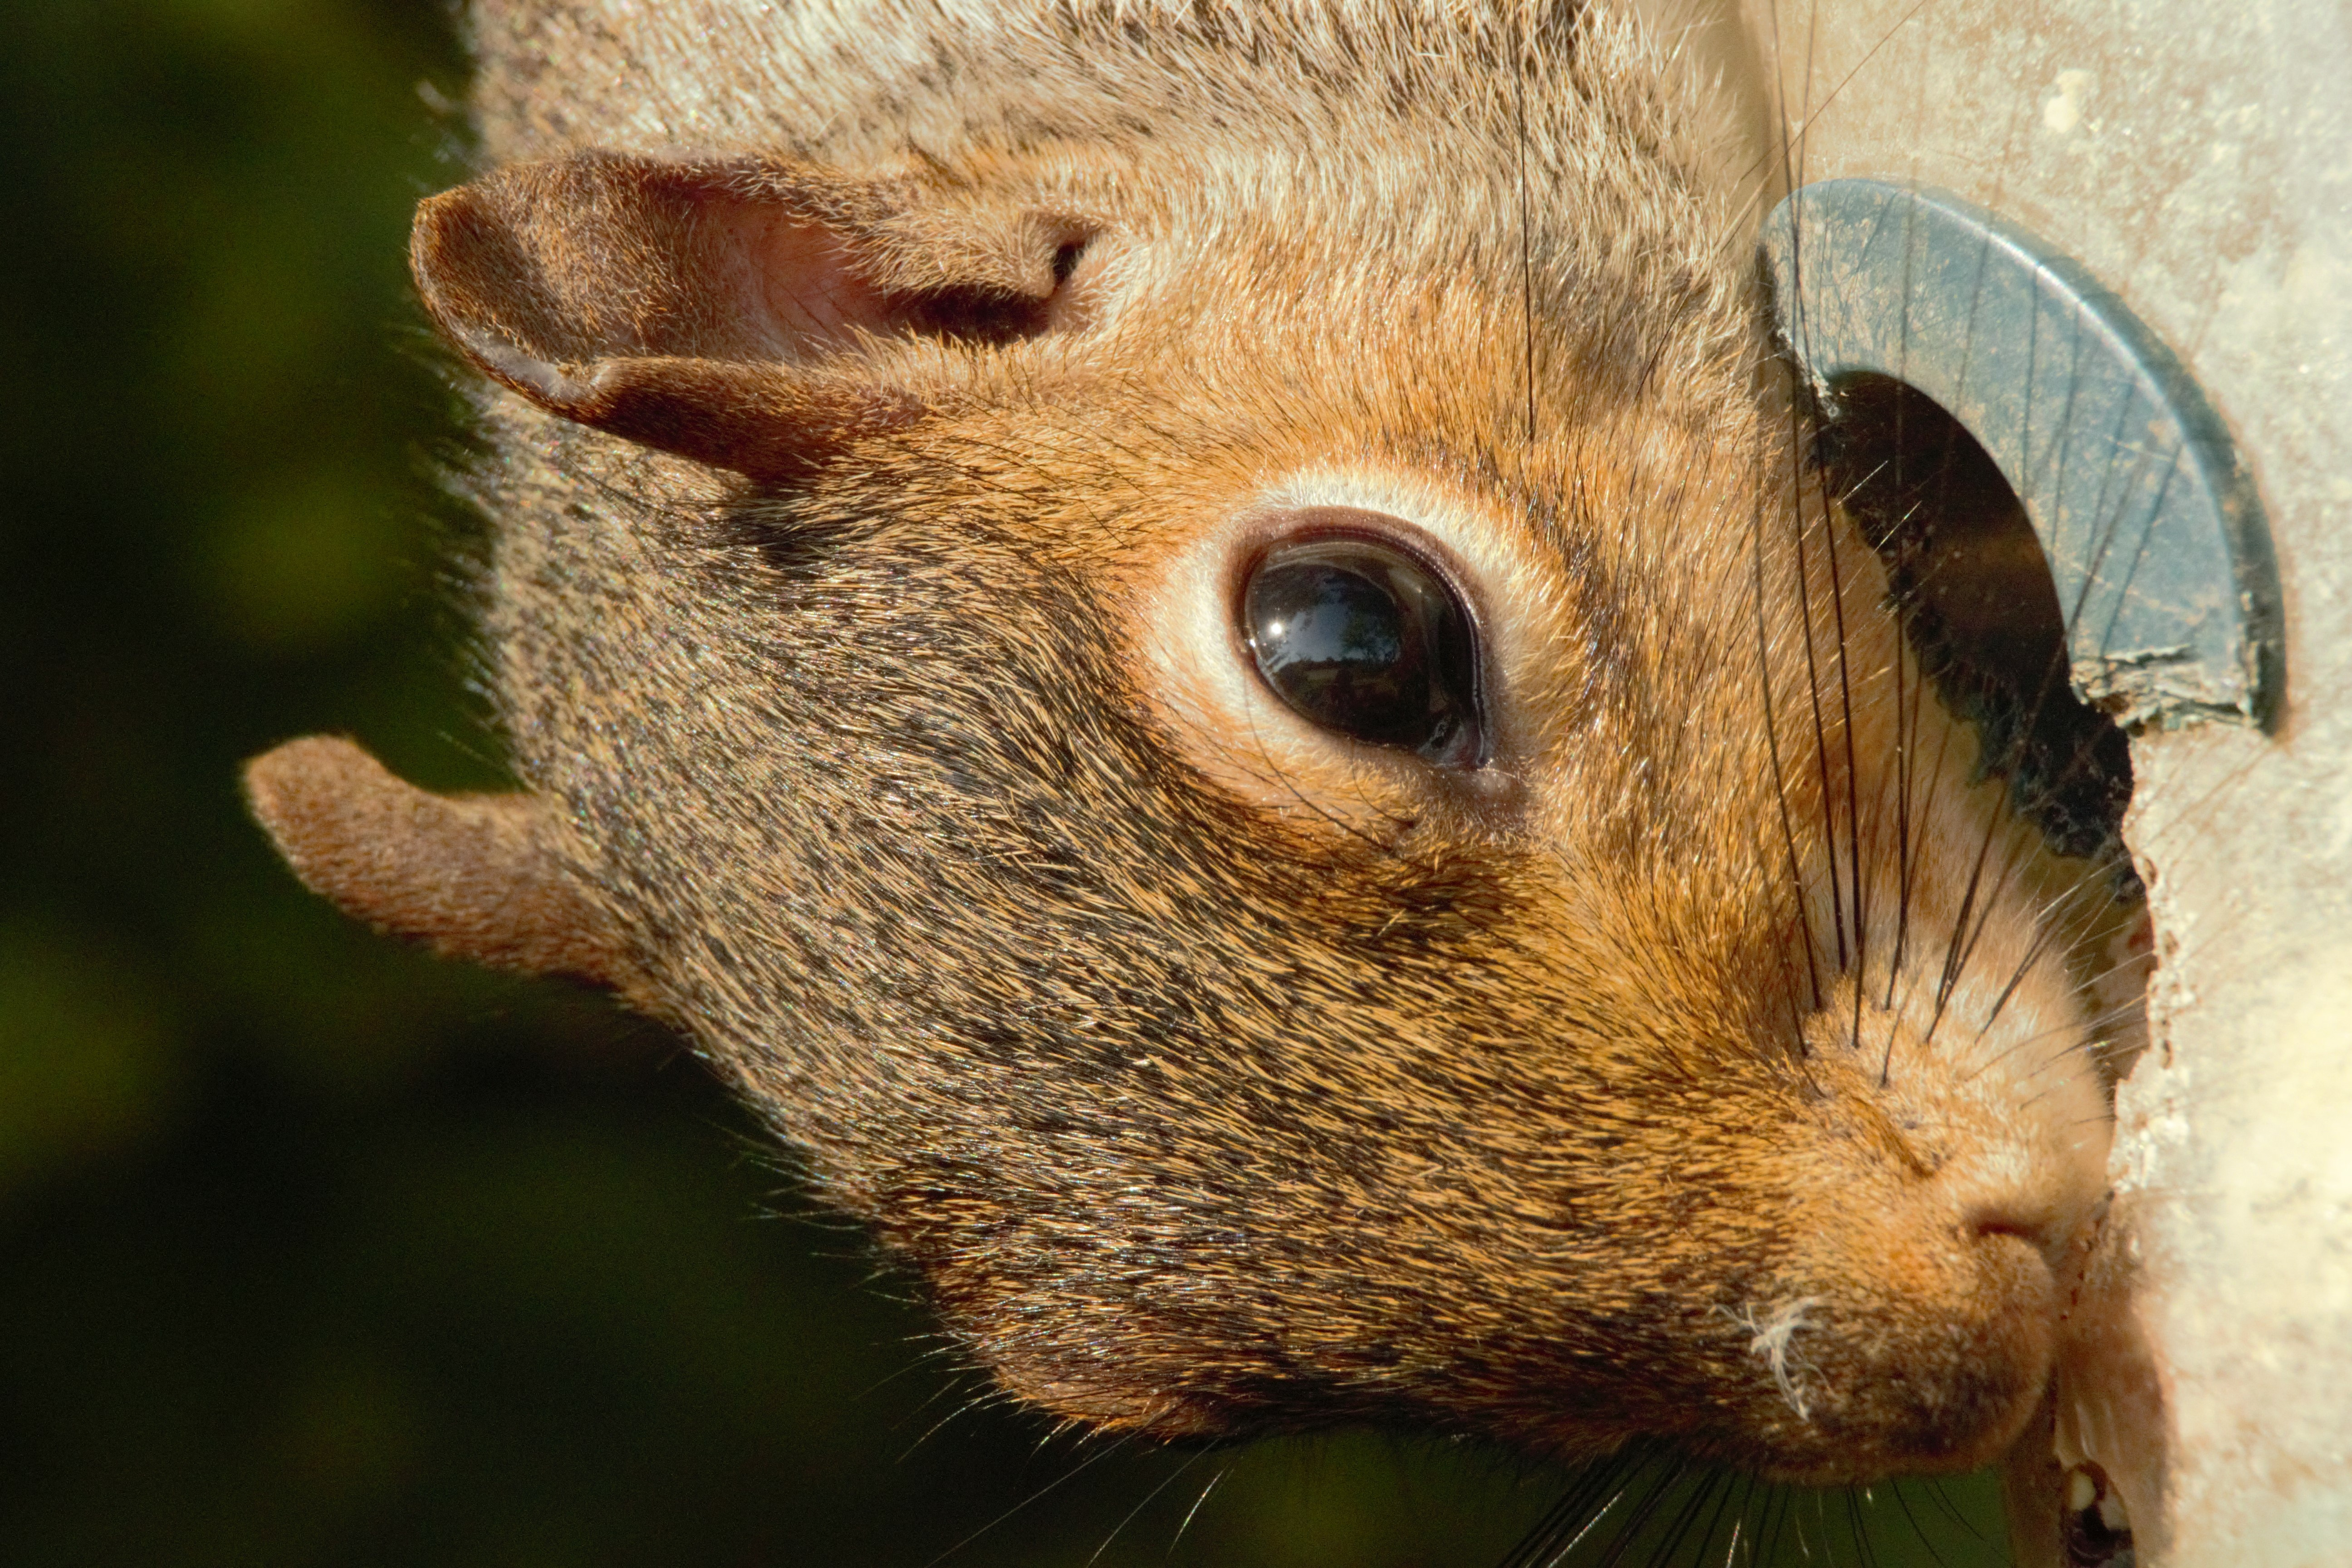 Grey squirrel gnawing at a bird nest box hole